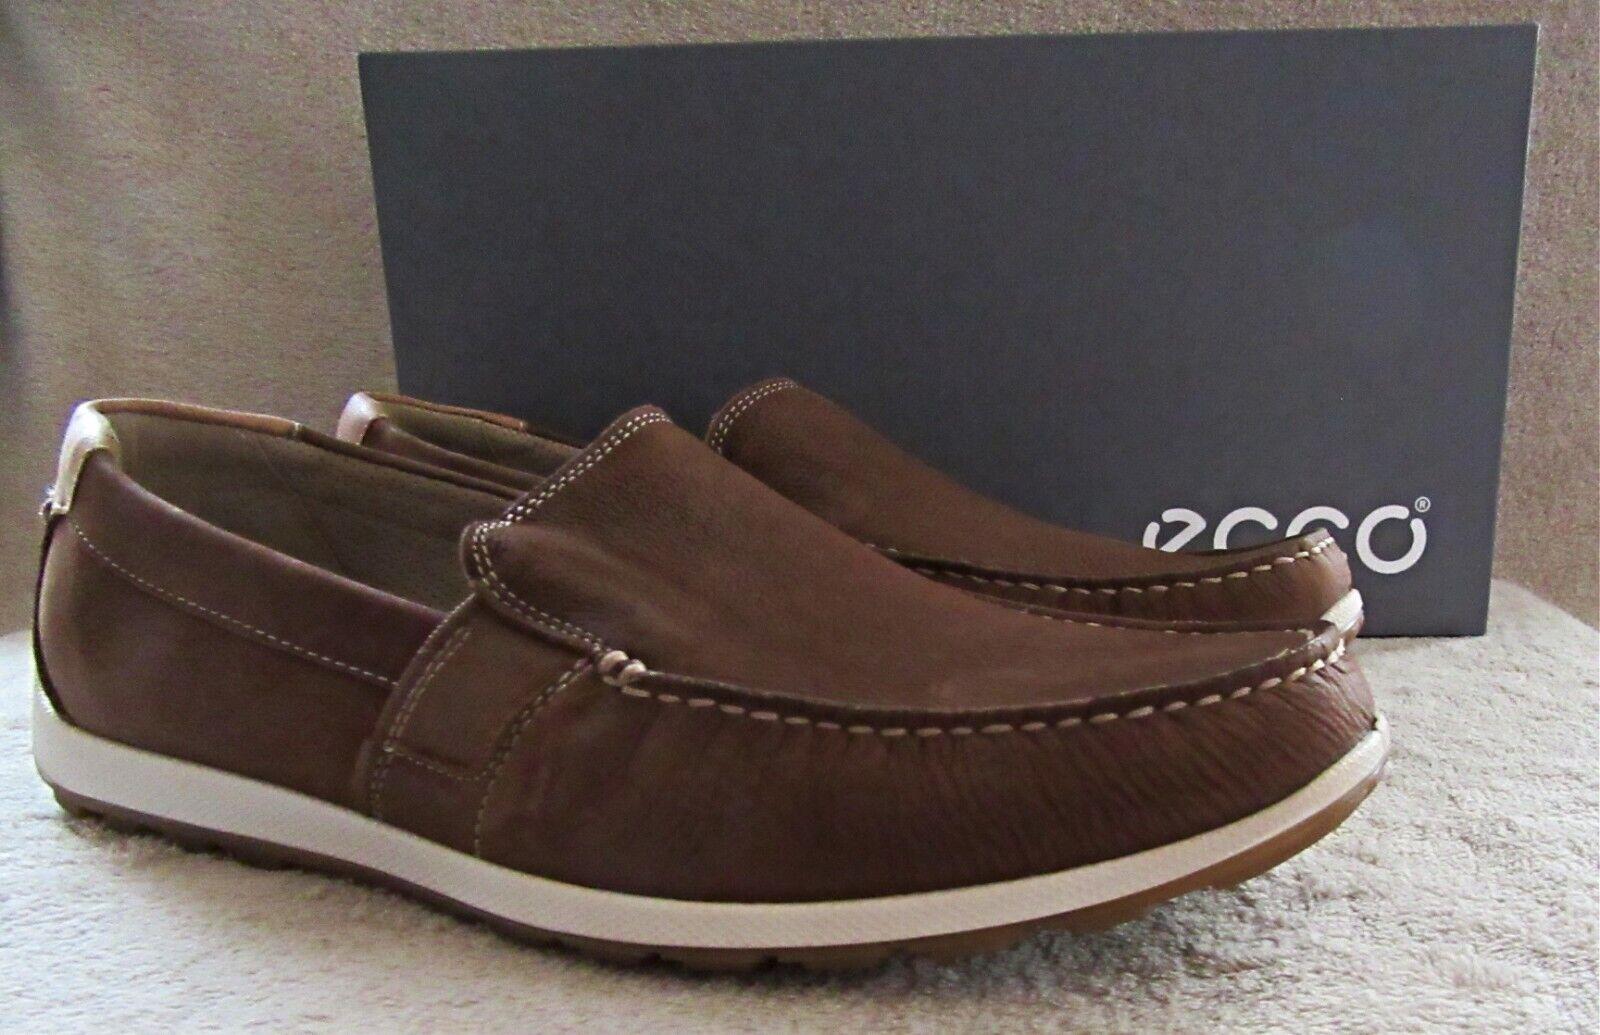 ECCO Reciprico Mahogany Nubuck Leather Moccasin shoes US 10 - 10.5 M EUR 44 NWB